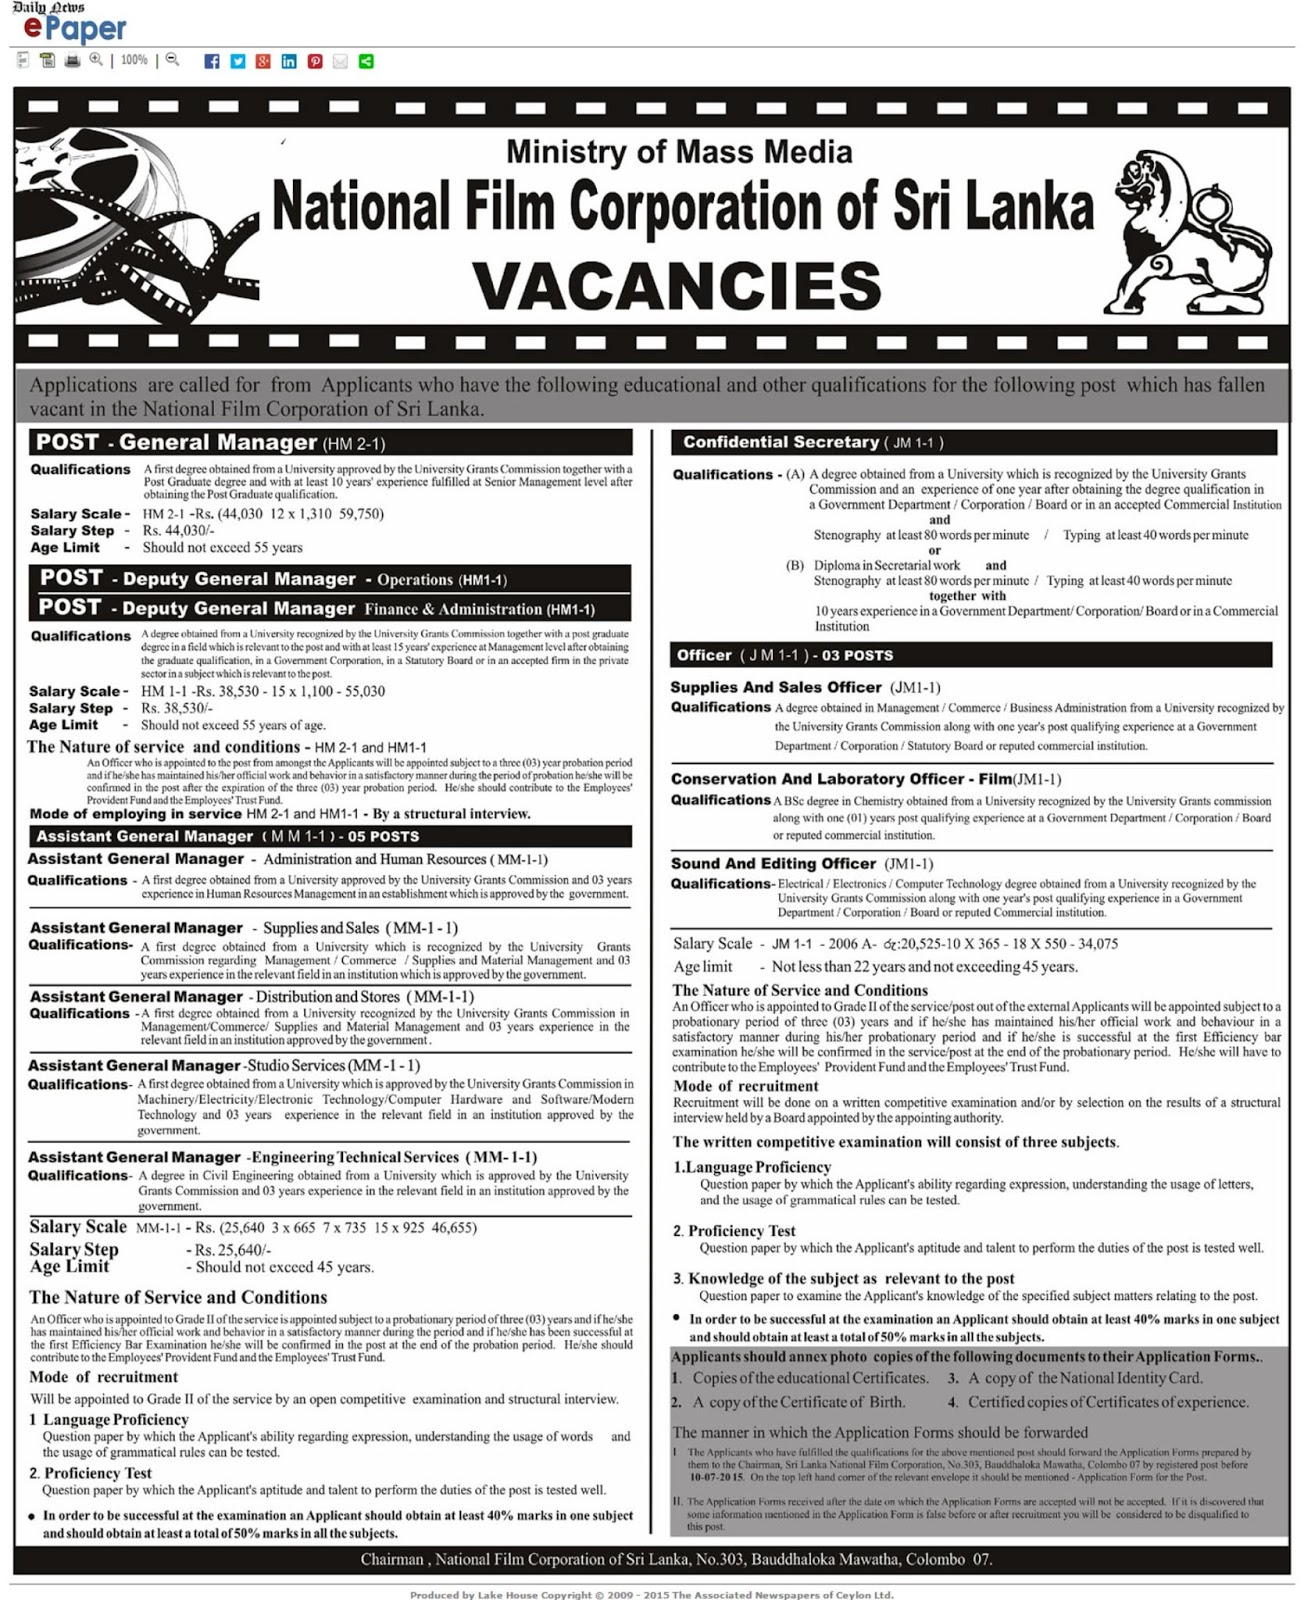 new: Executive Jobs - National Film Corporation Vacancies